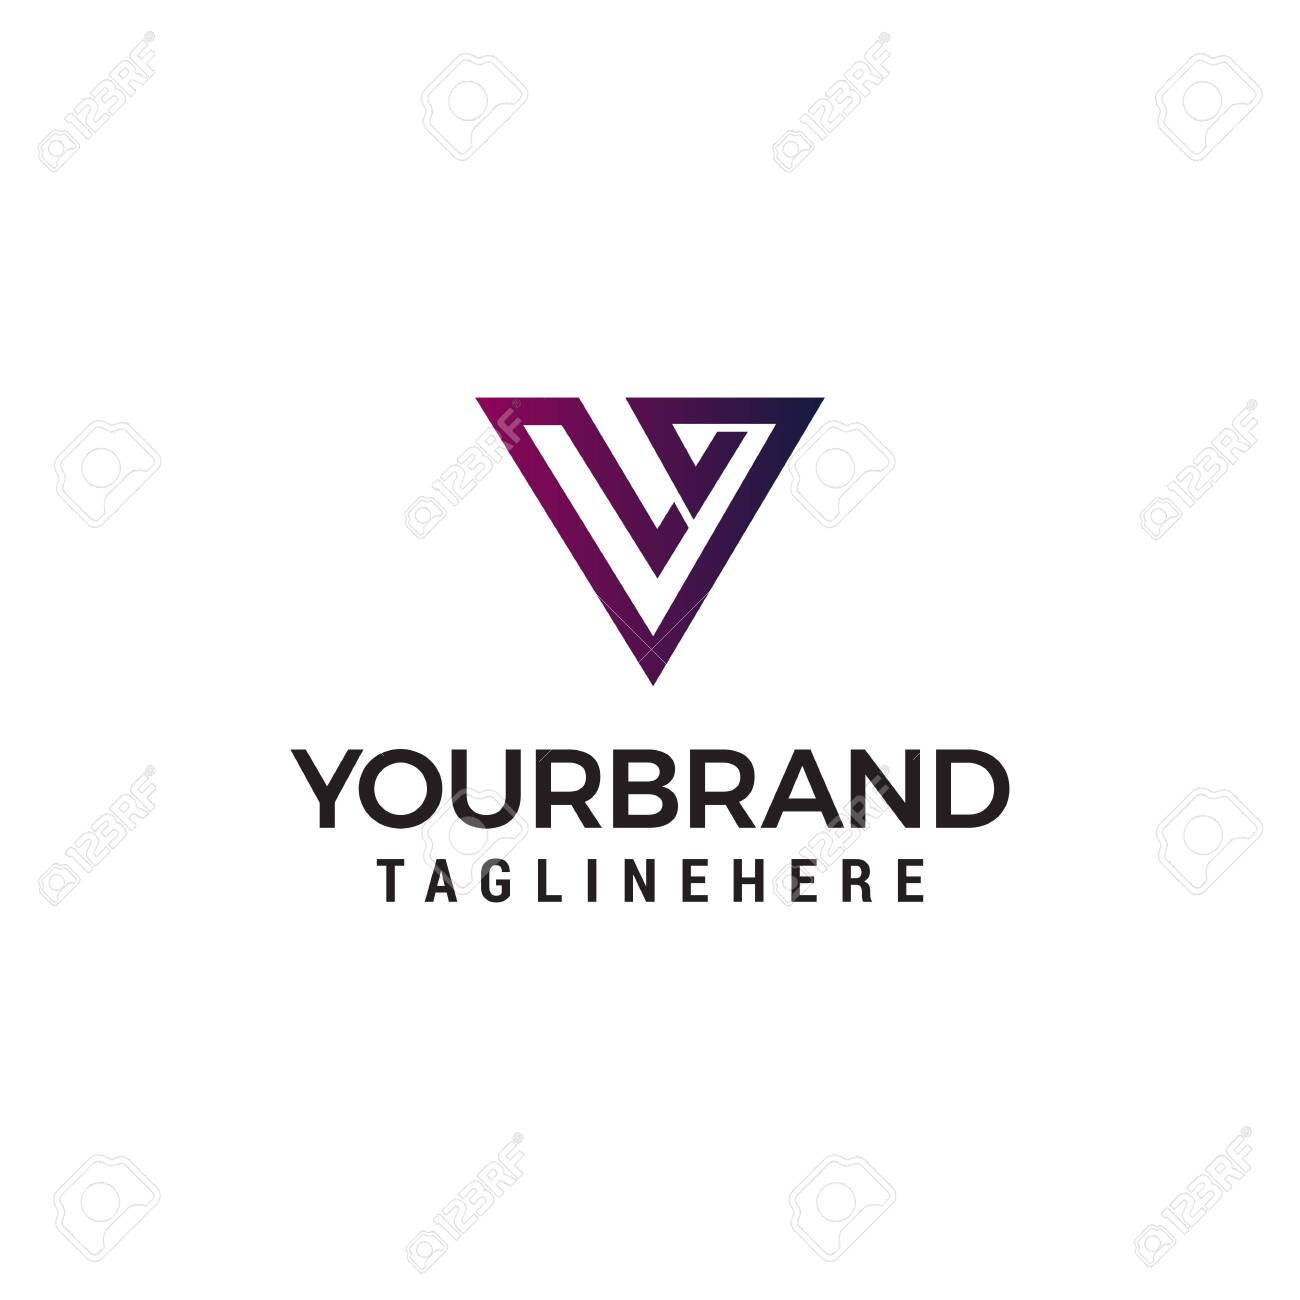 letter v abstract logo design concept template vector - 123217089